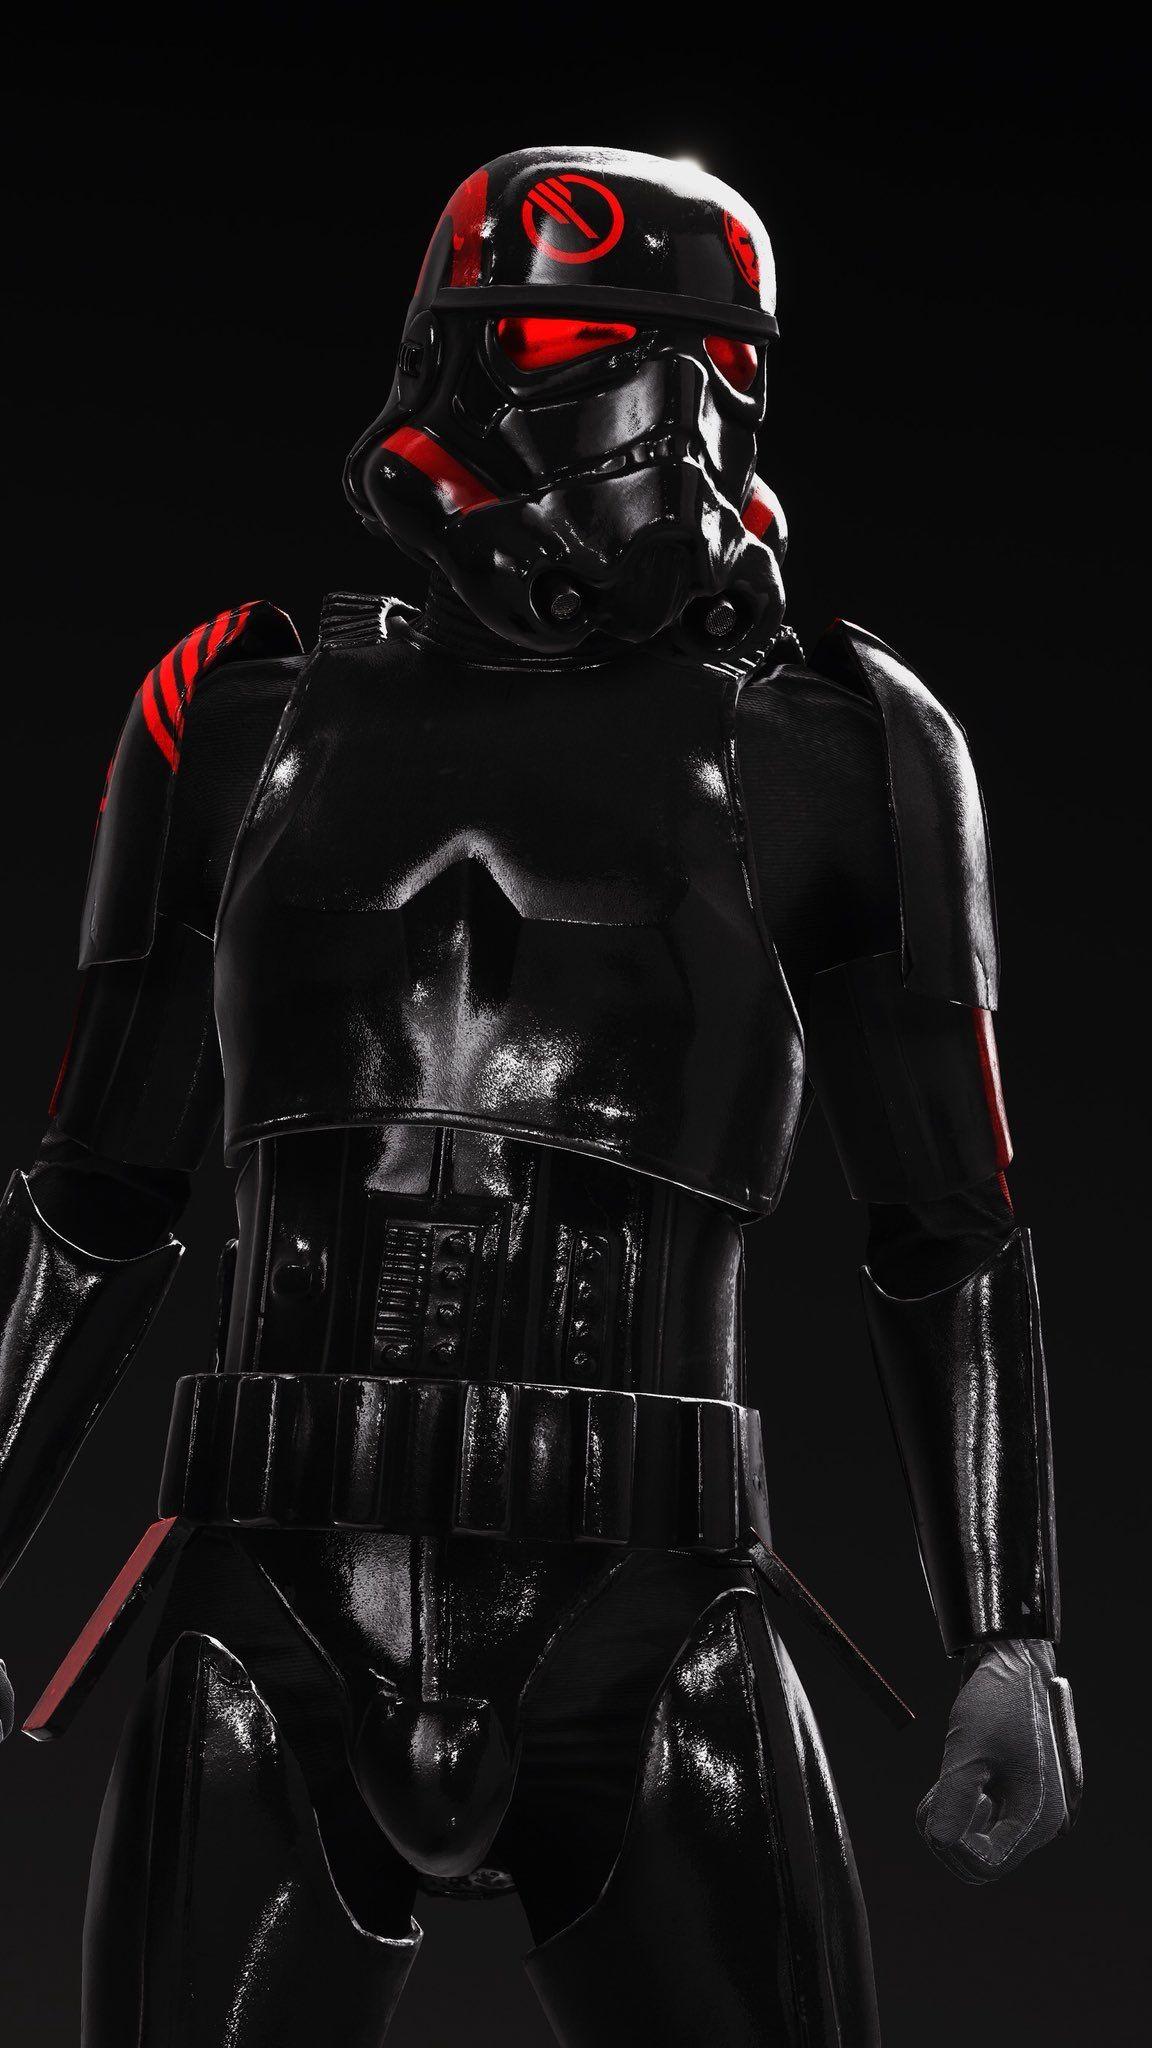 Inferno squad star wars art star wars costumes star - Stormtrooper suit wallpaper ...